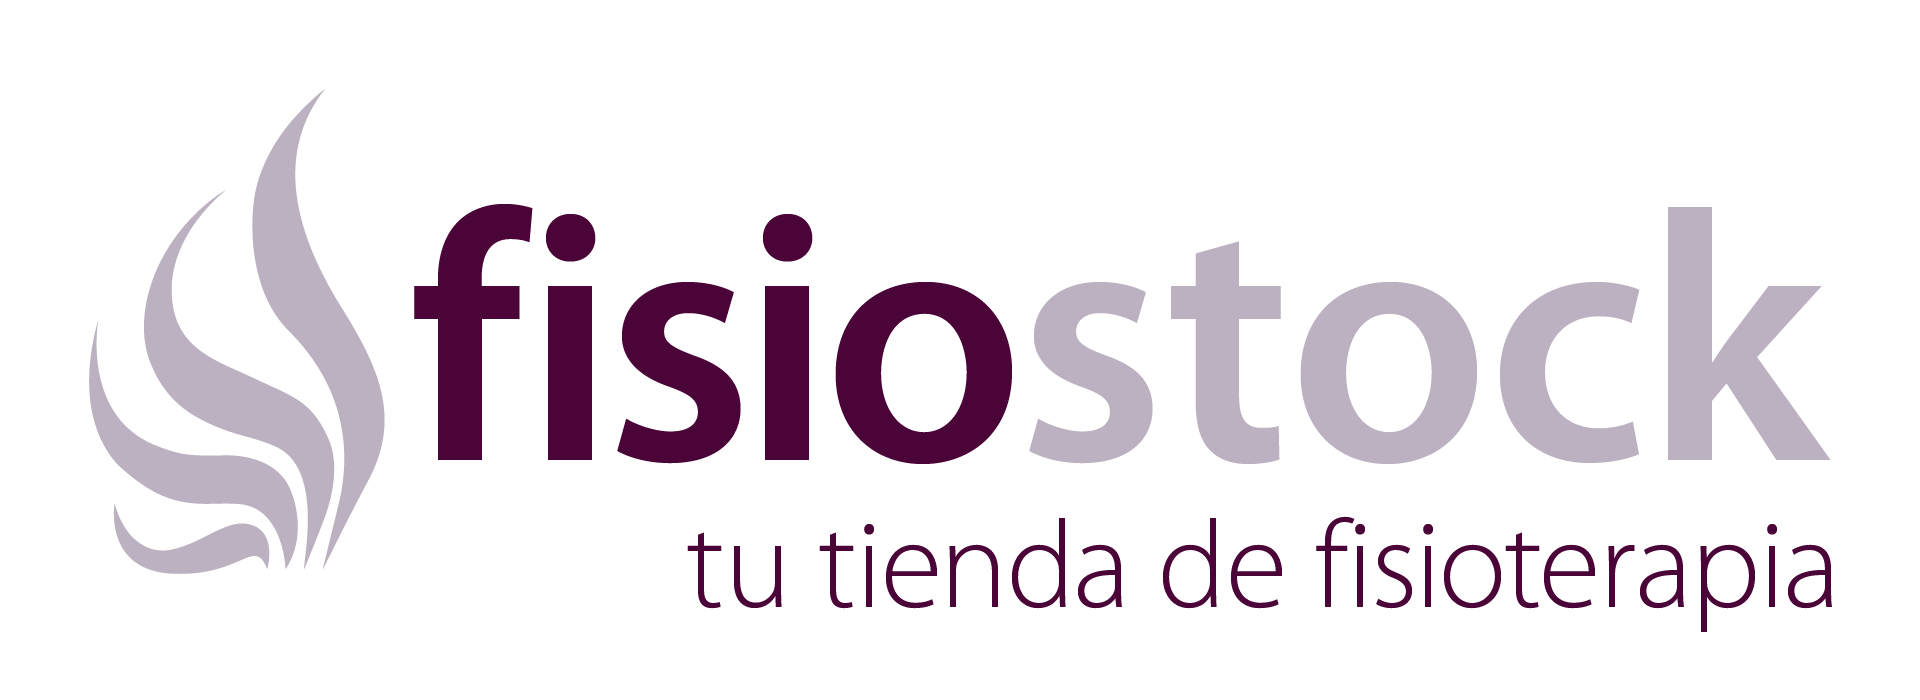 Ir a FisioStock